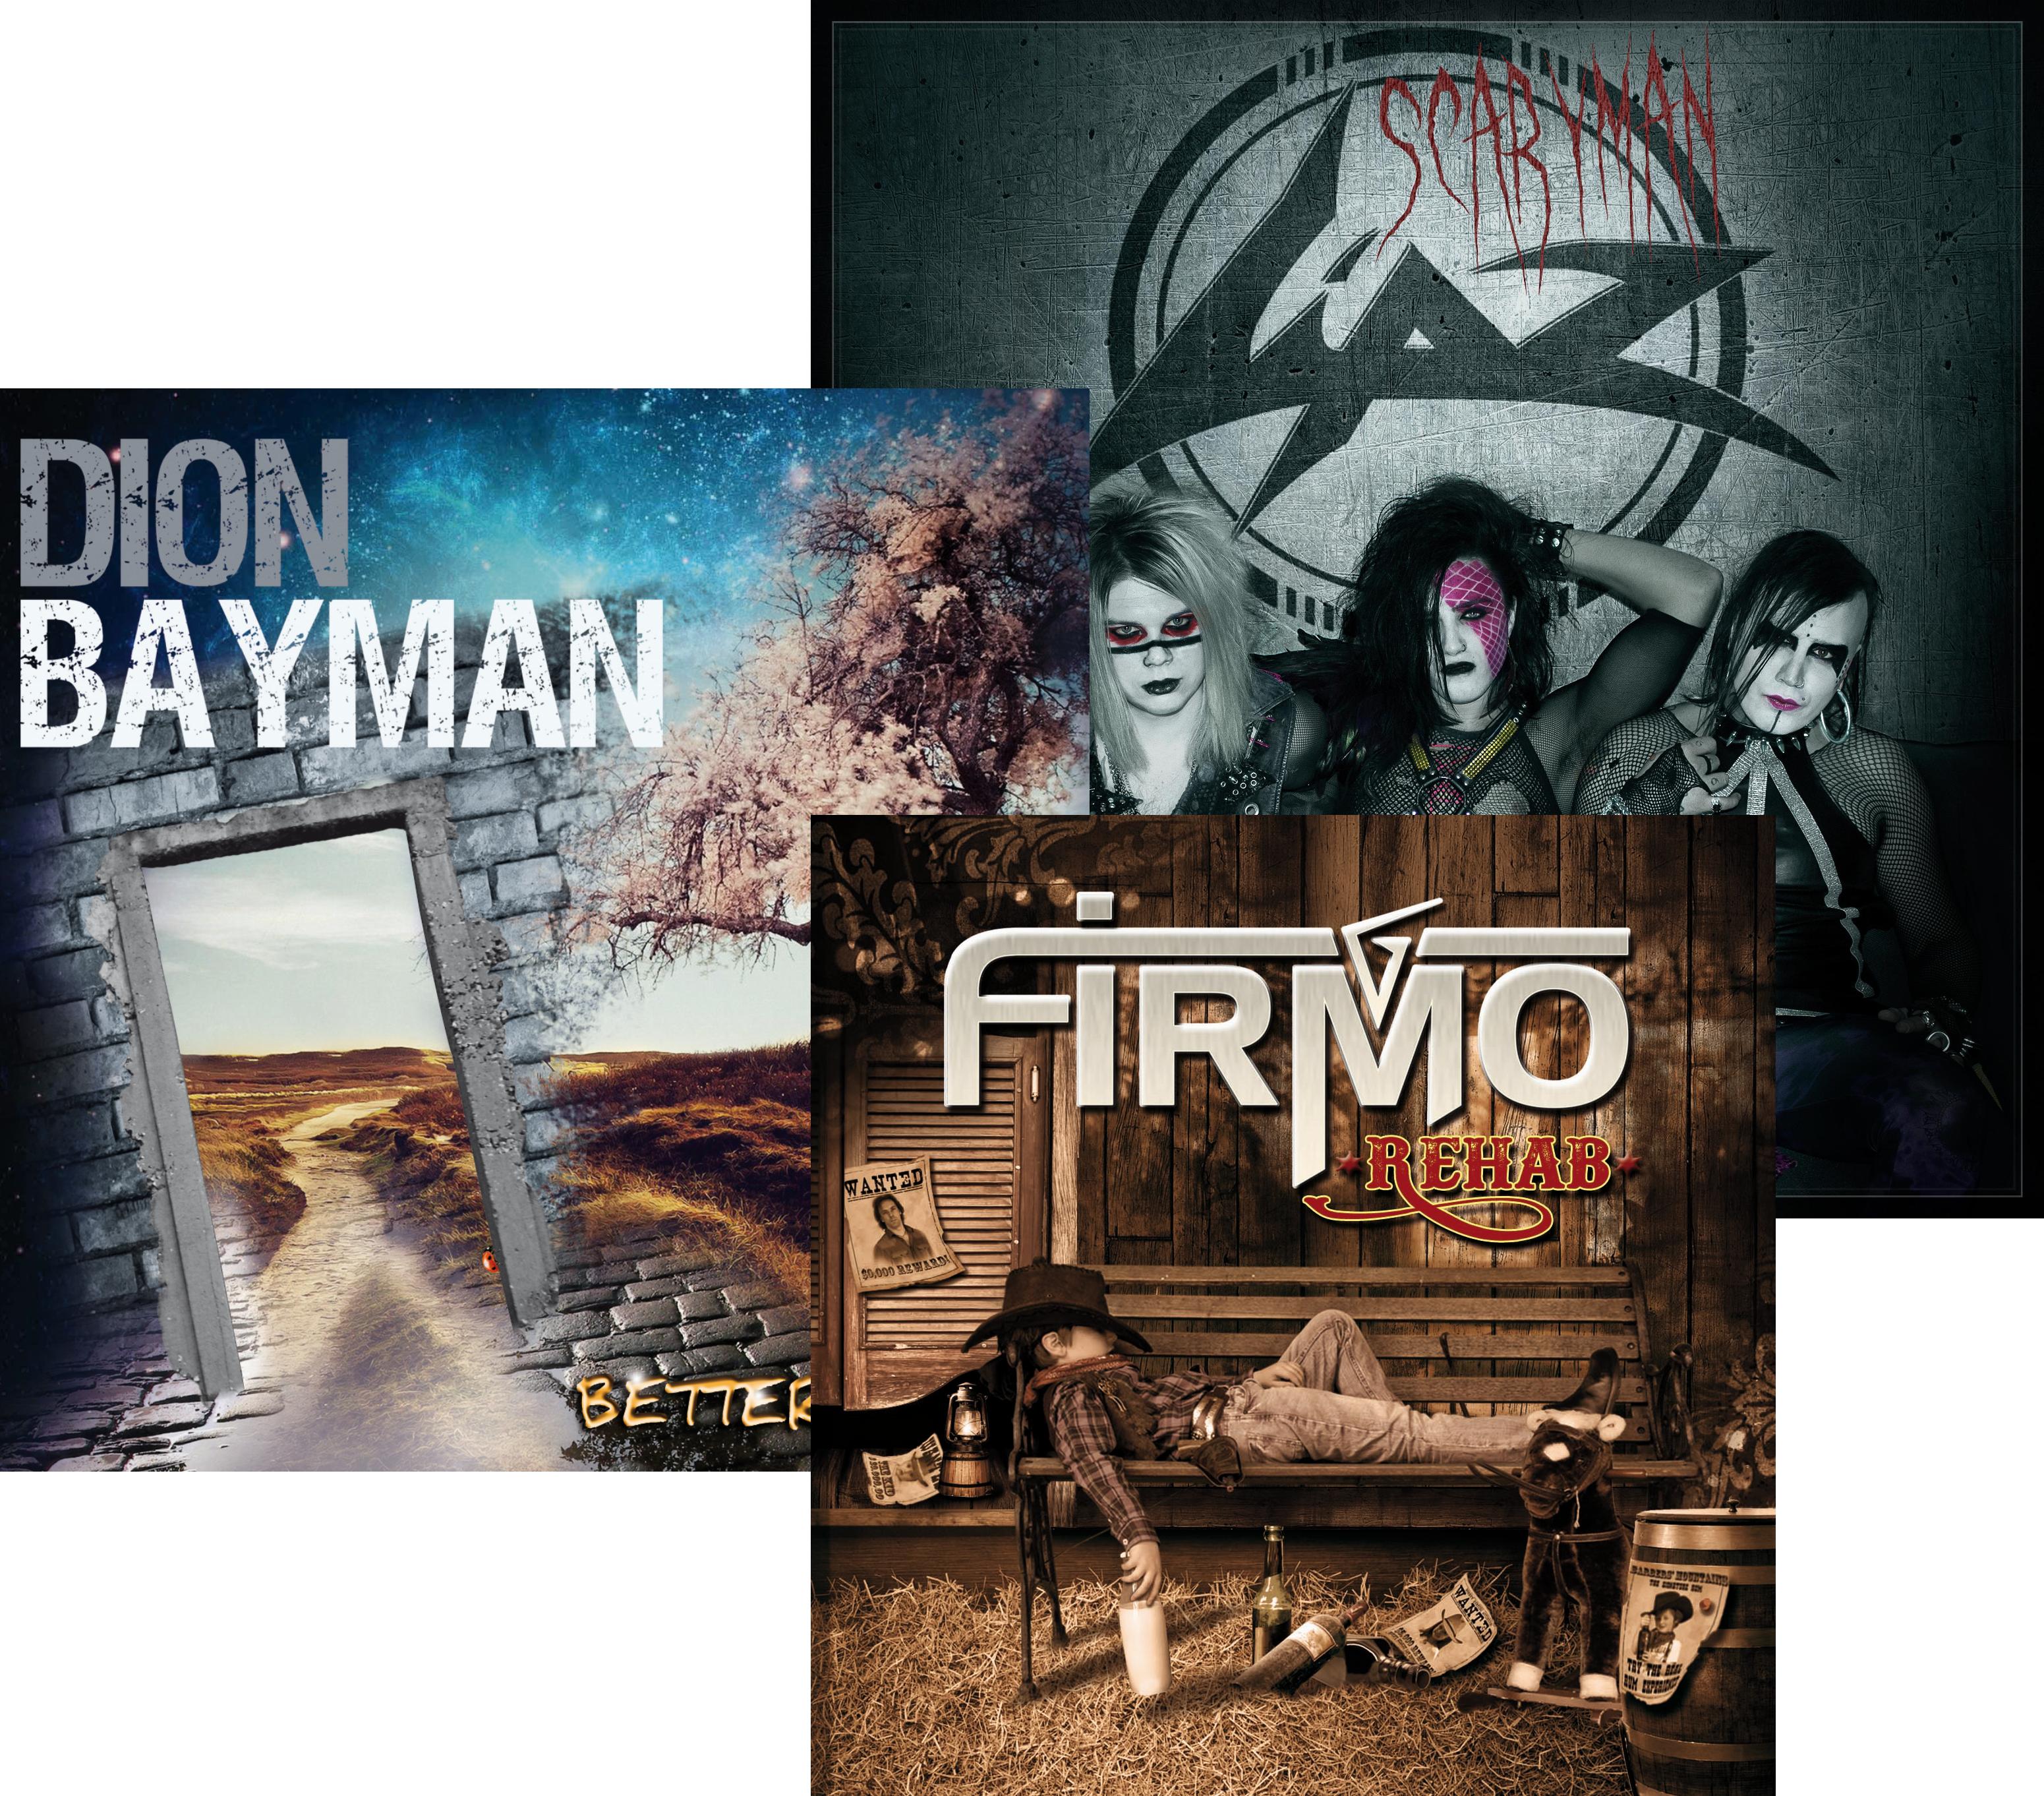 Dion Bayman / LIPZ / FIRMO - Bundle 0000014